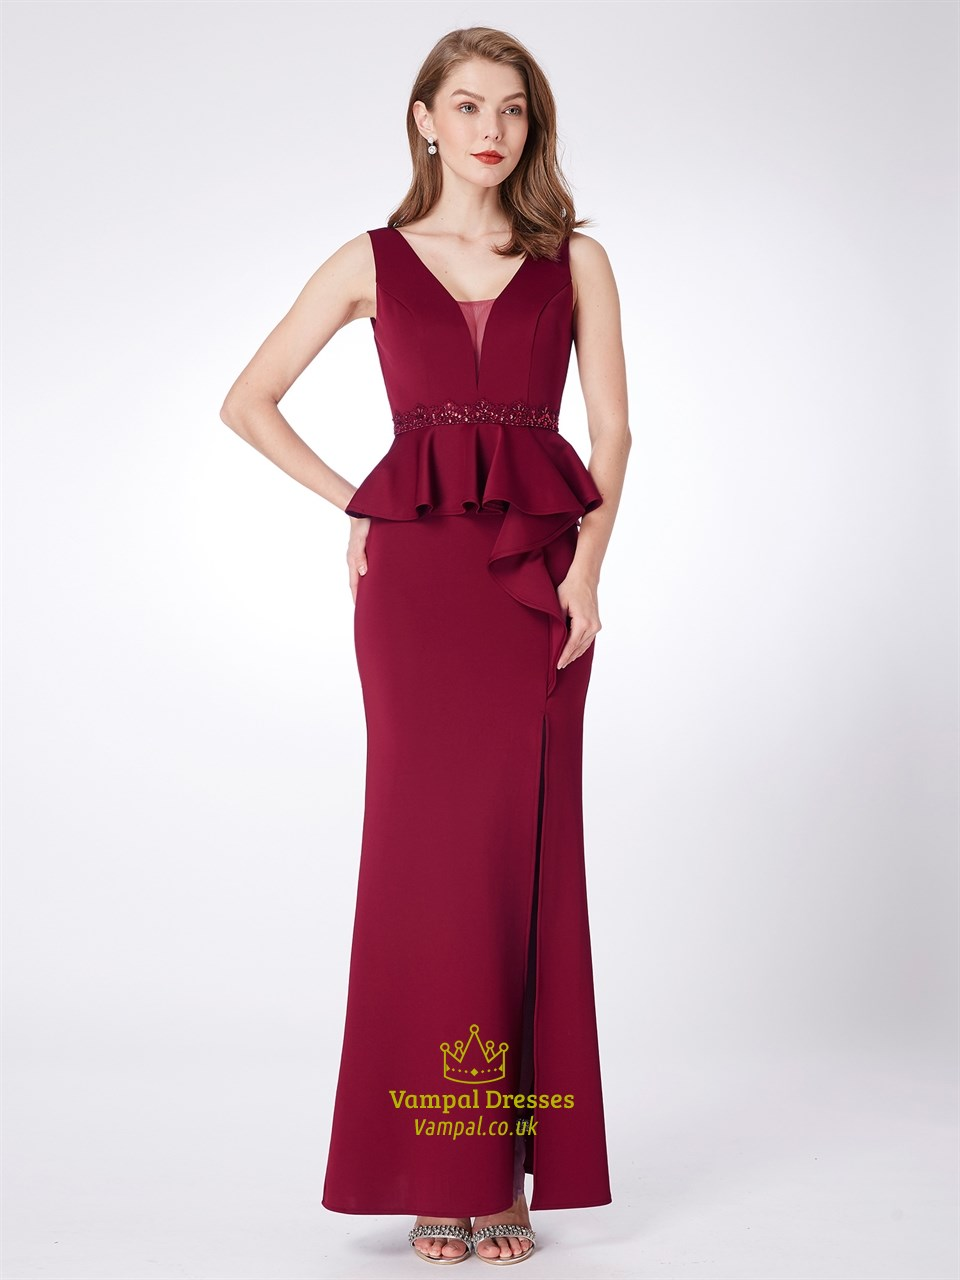 Burgundy V Neck Sheath Beaded Prom Dress With Ruffles And